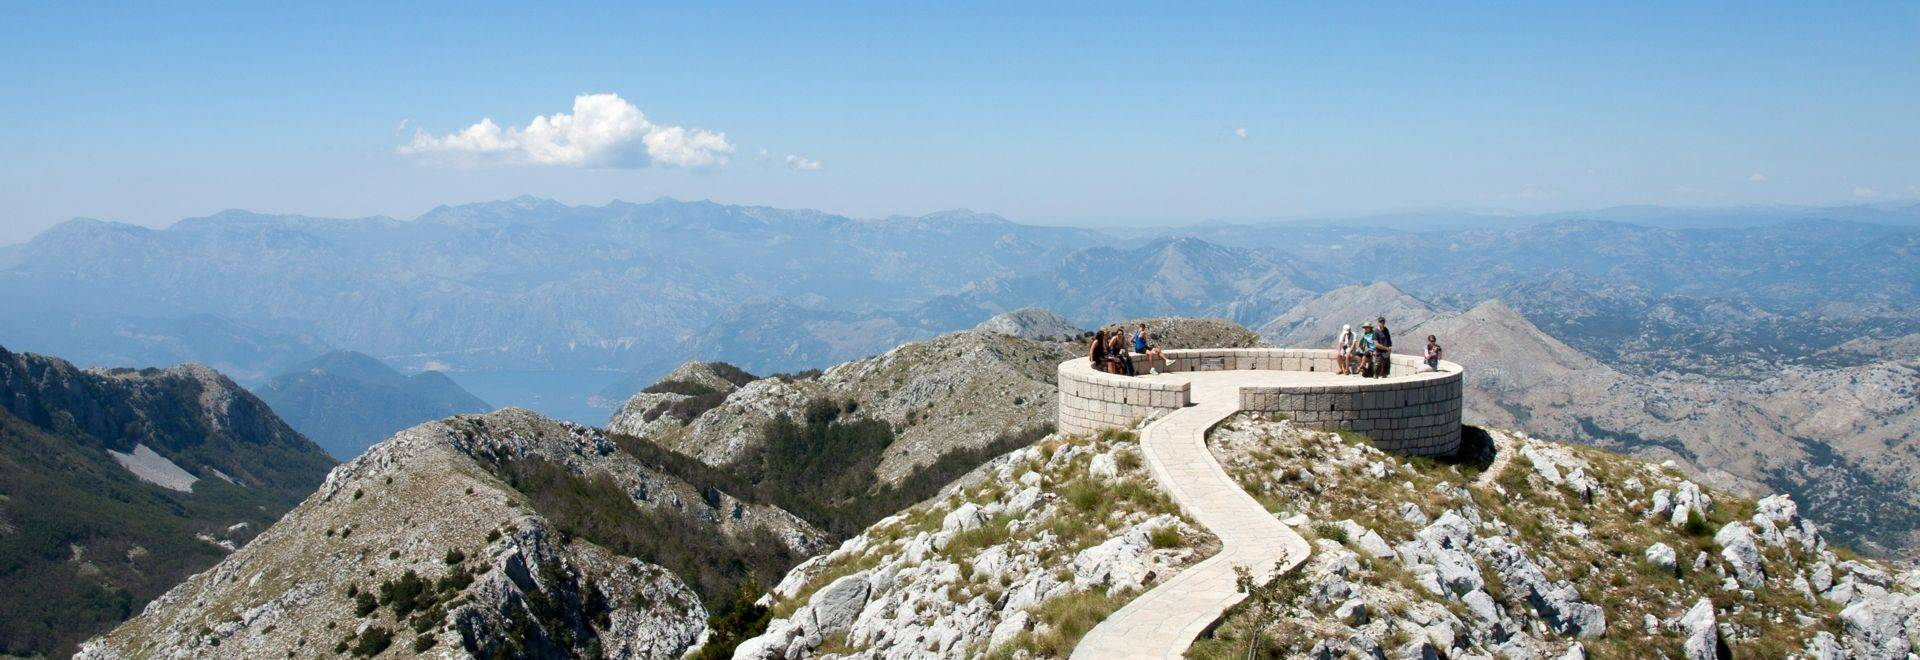 Shutterstock 201996565 The View Point Of Lovchen In Montenegro